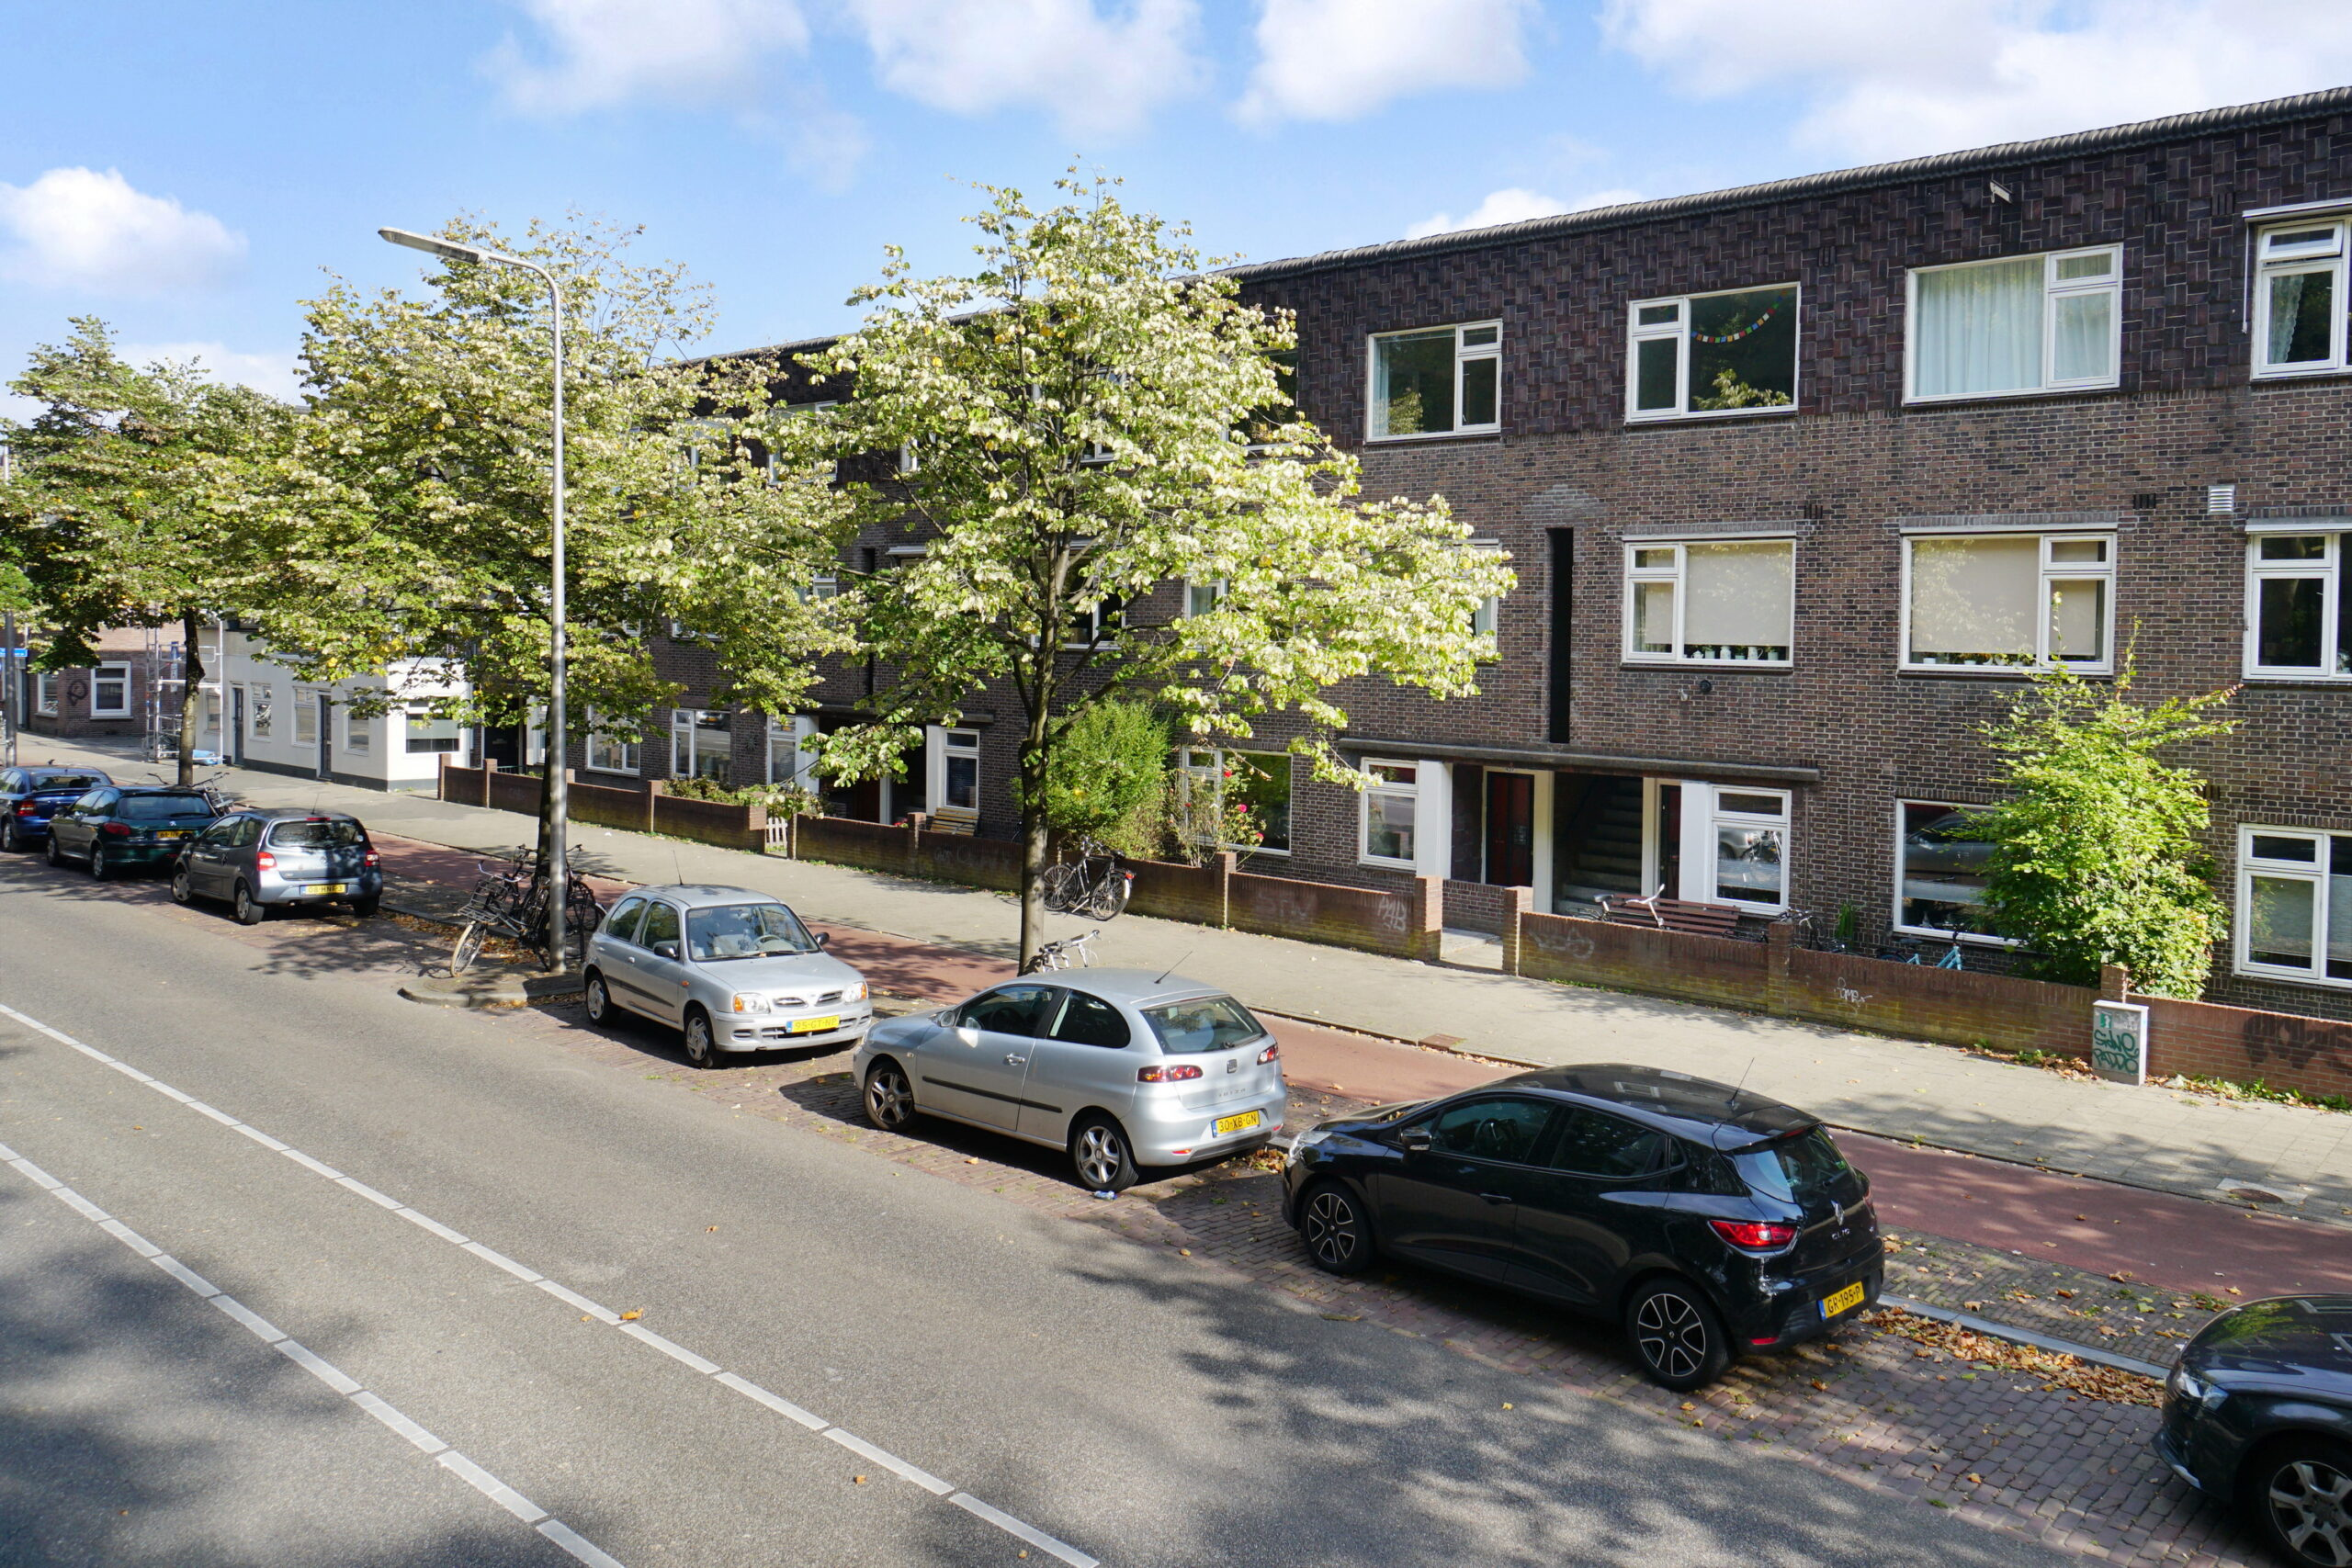 Amsterdamsestraatweg 459 B, 3553 EC Utrecht